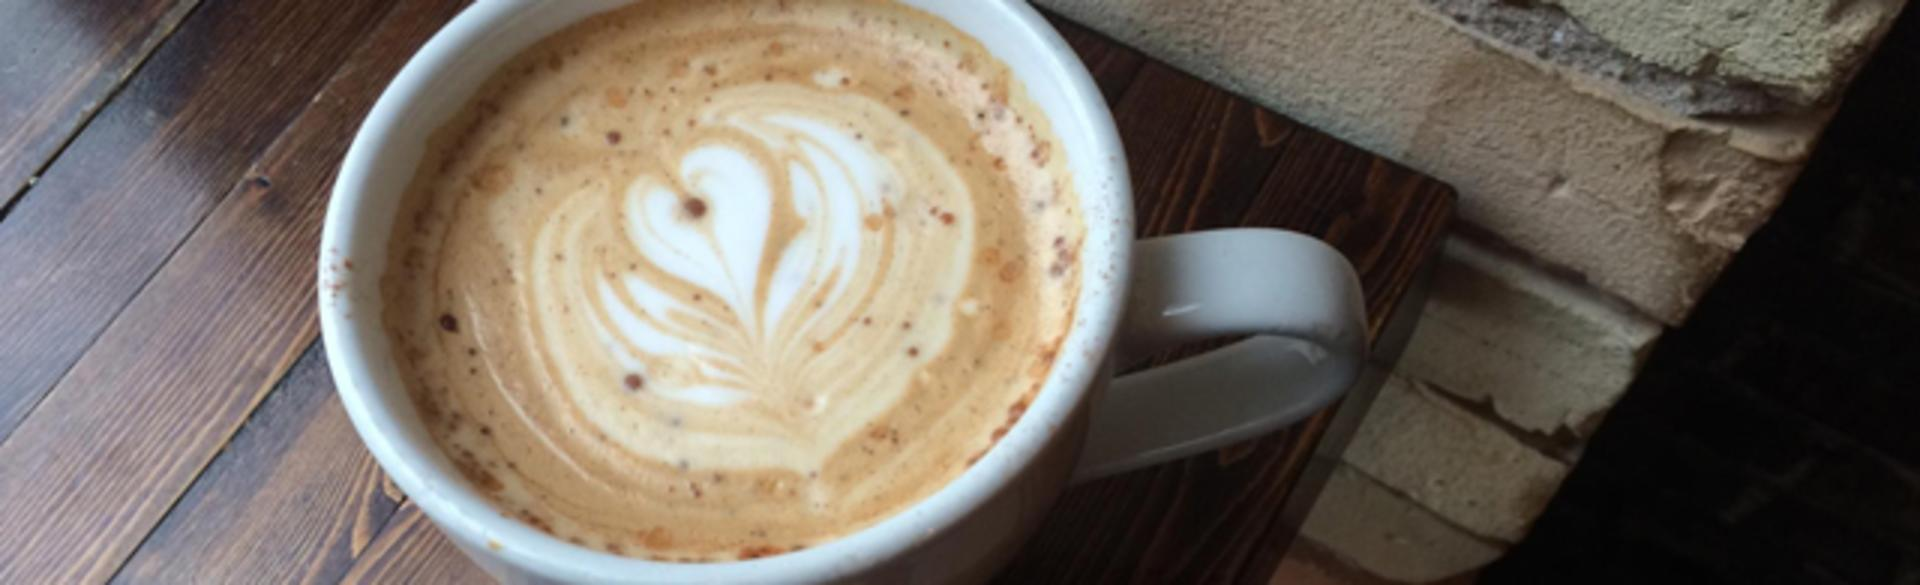 Lantern Coffee Cafe Miel